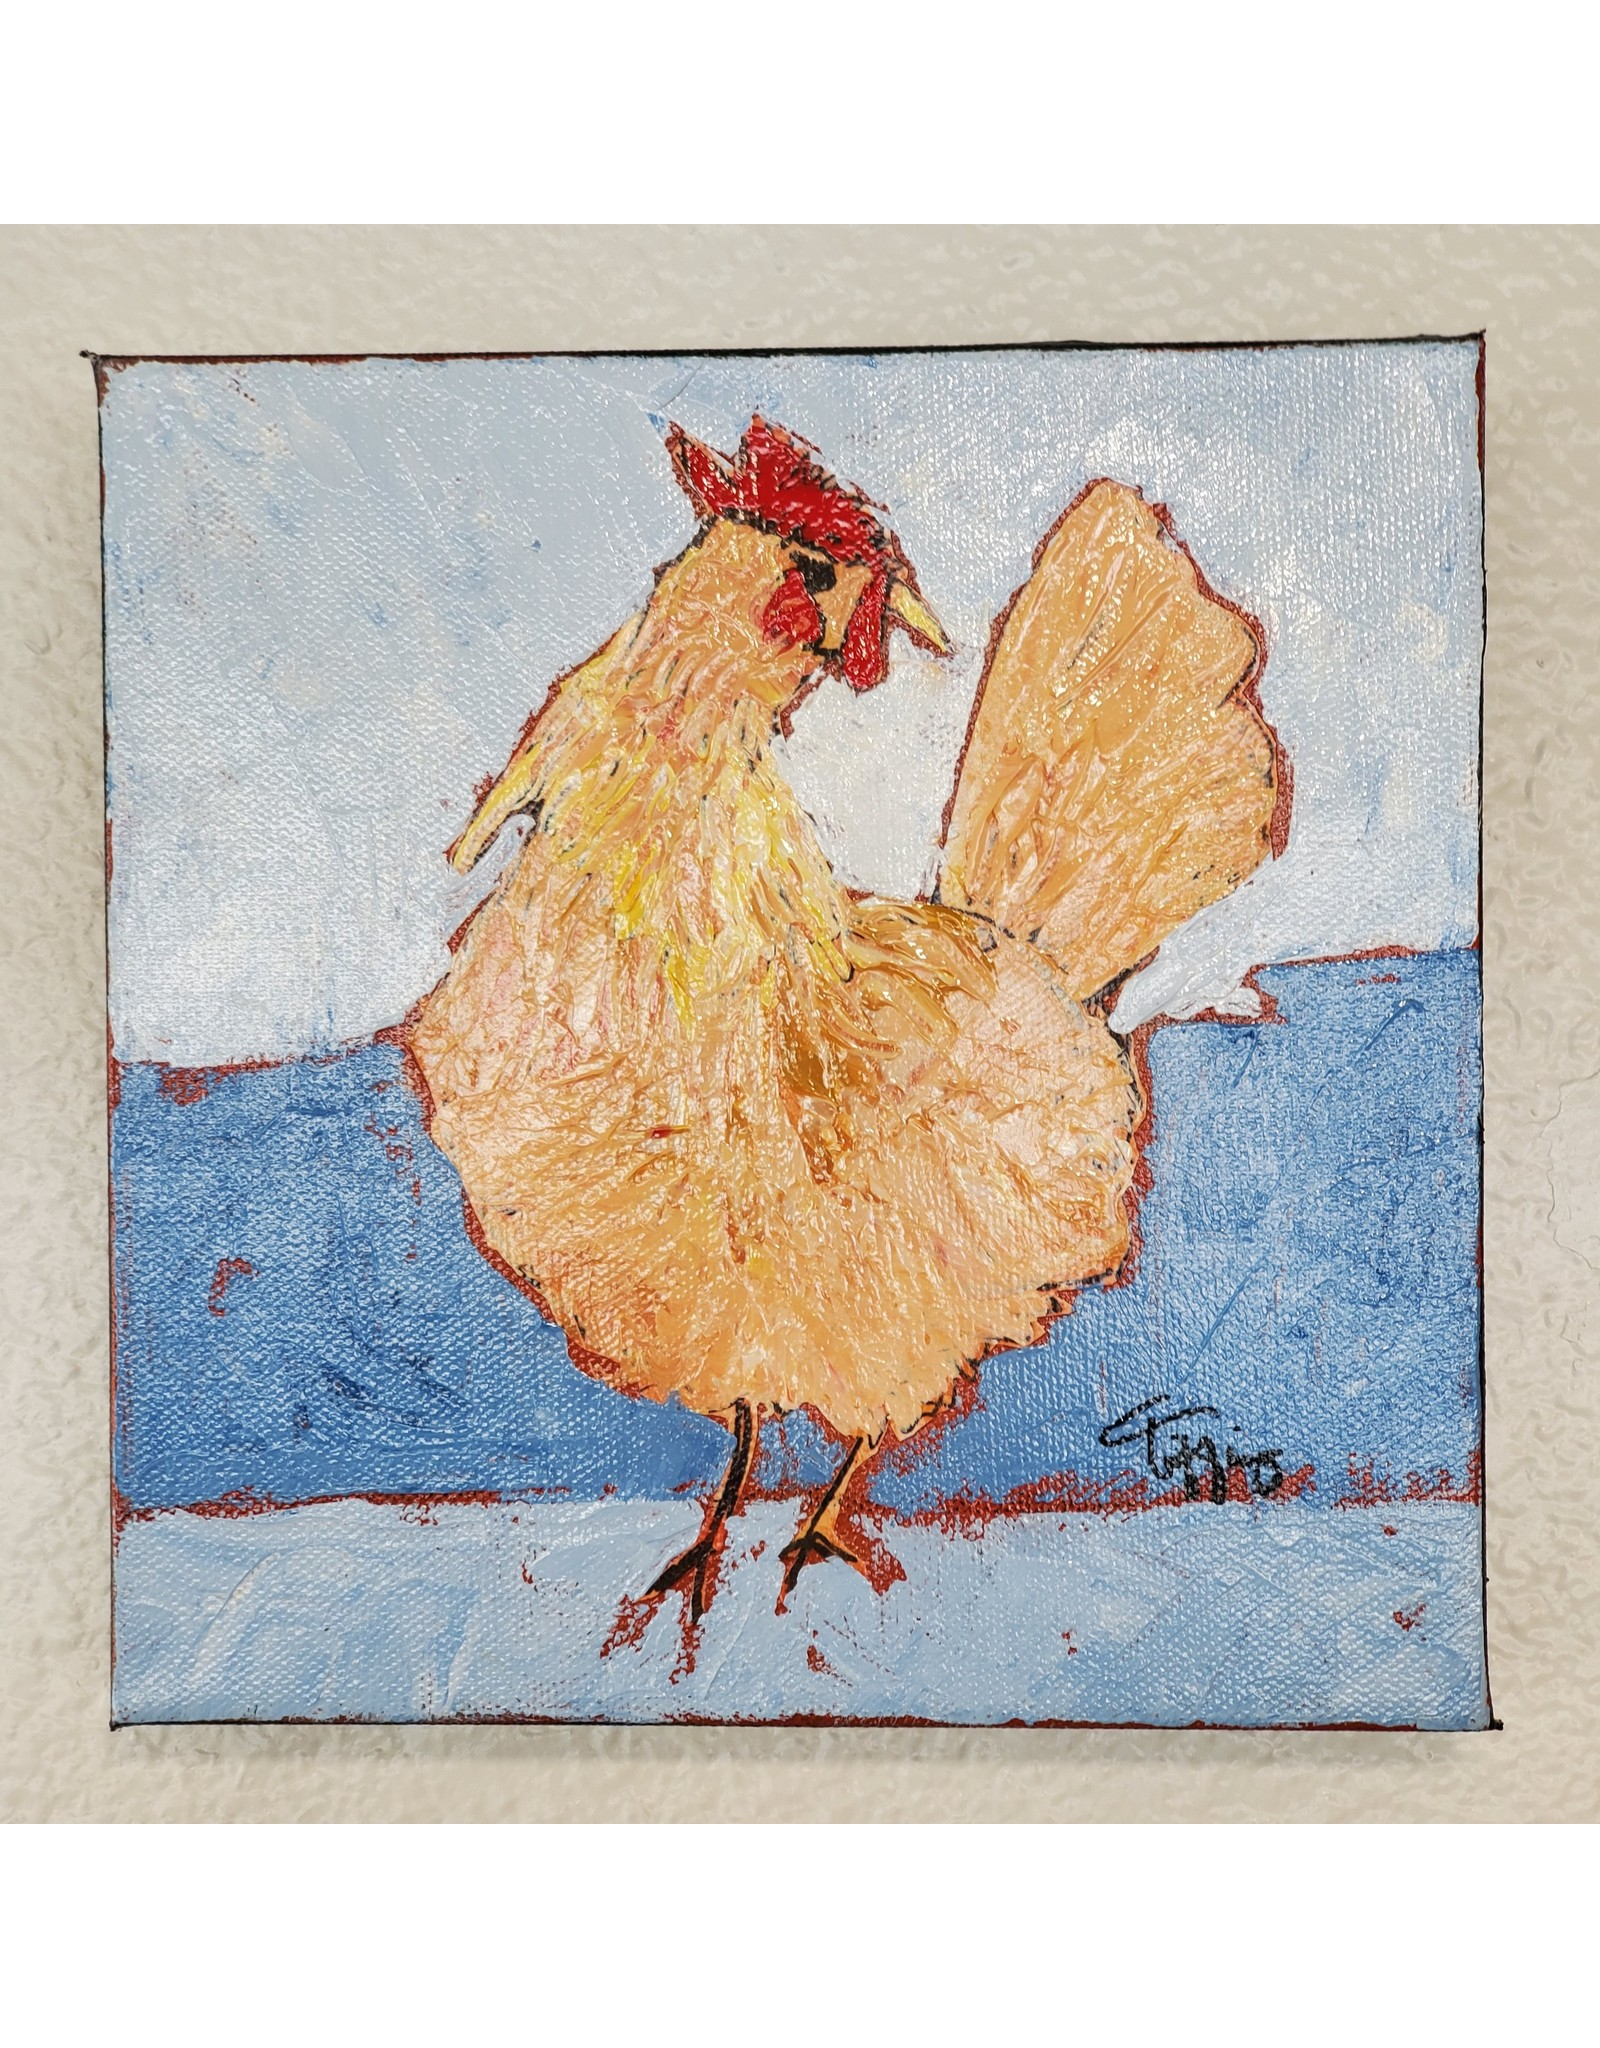 Inspire Farms Original Art - Rosy the Chicken  - Tiffiny Lilley